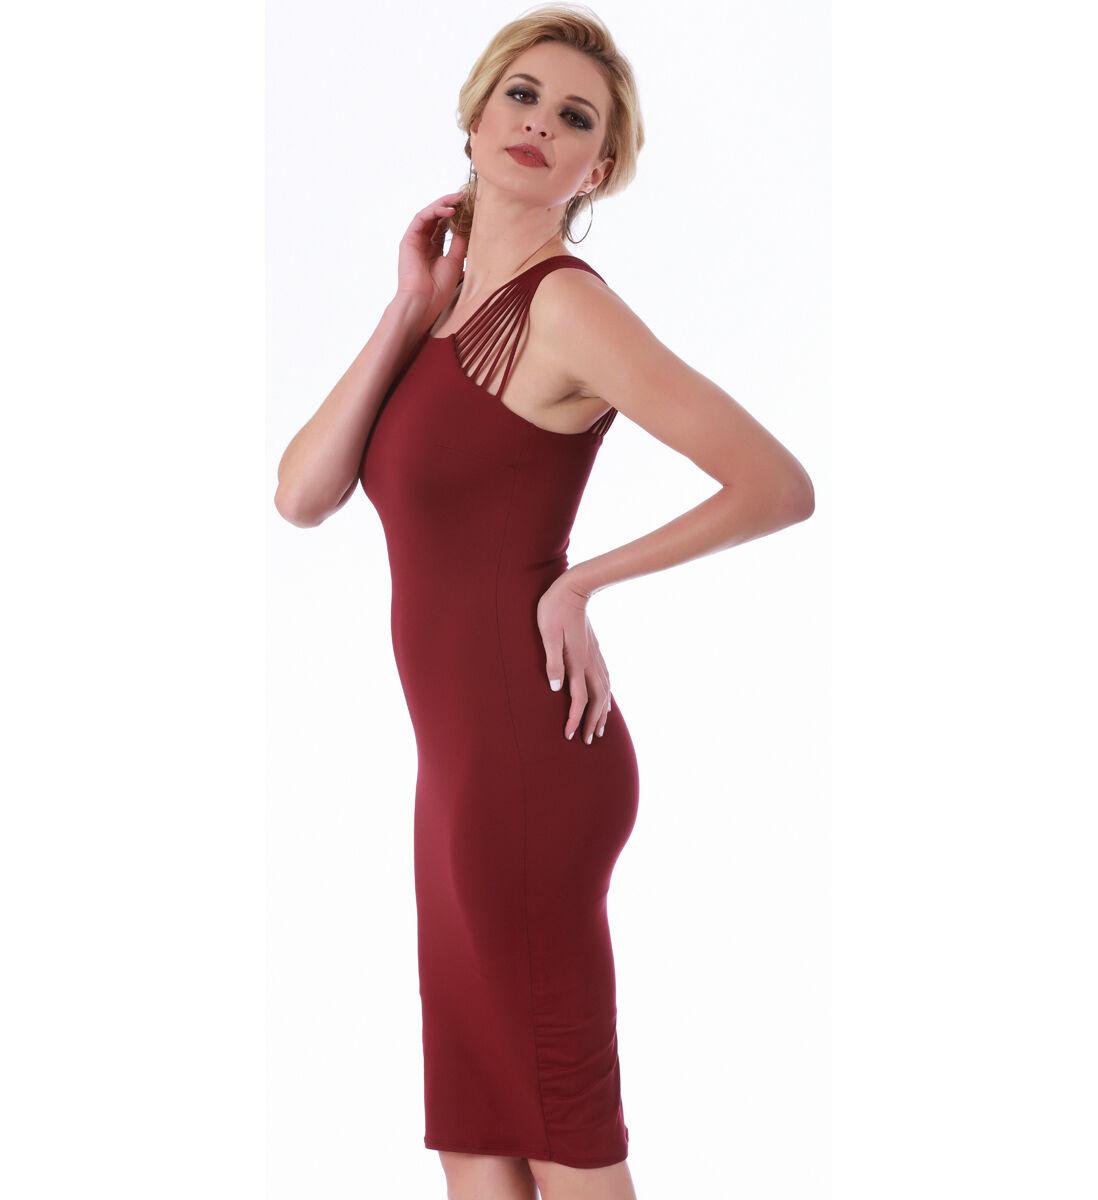 LaMonir Short Dress with Strappy Shoulders